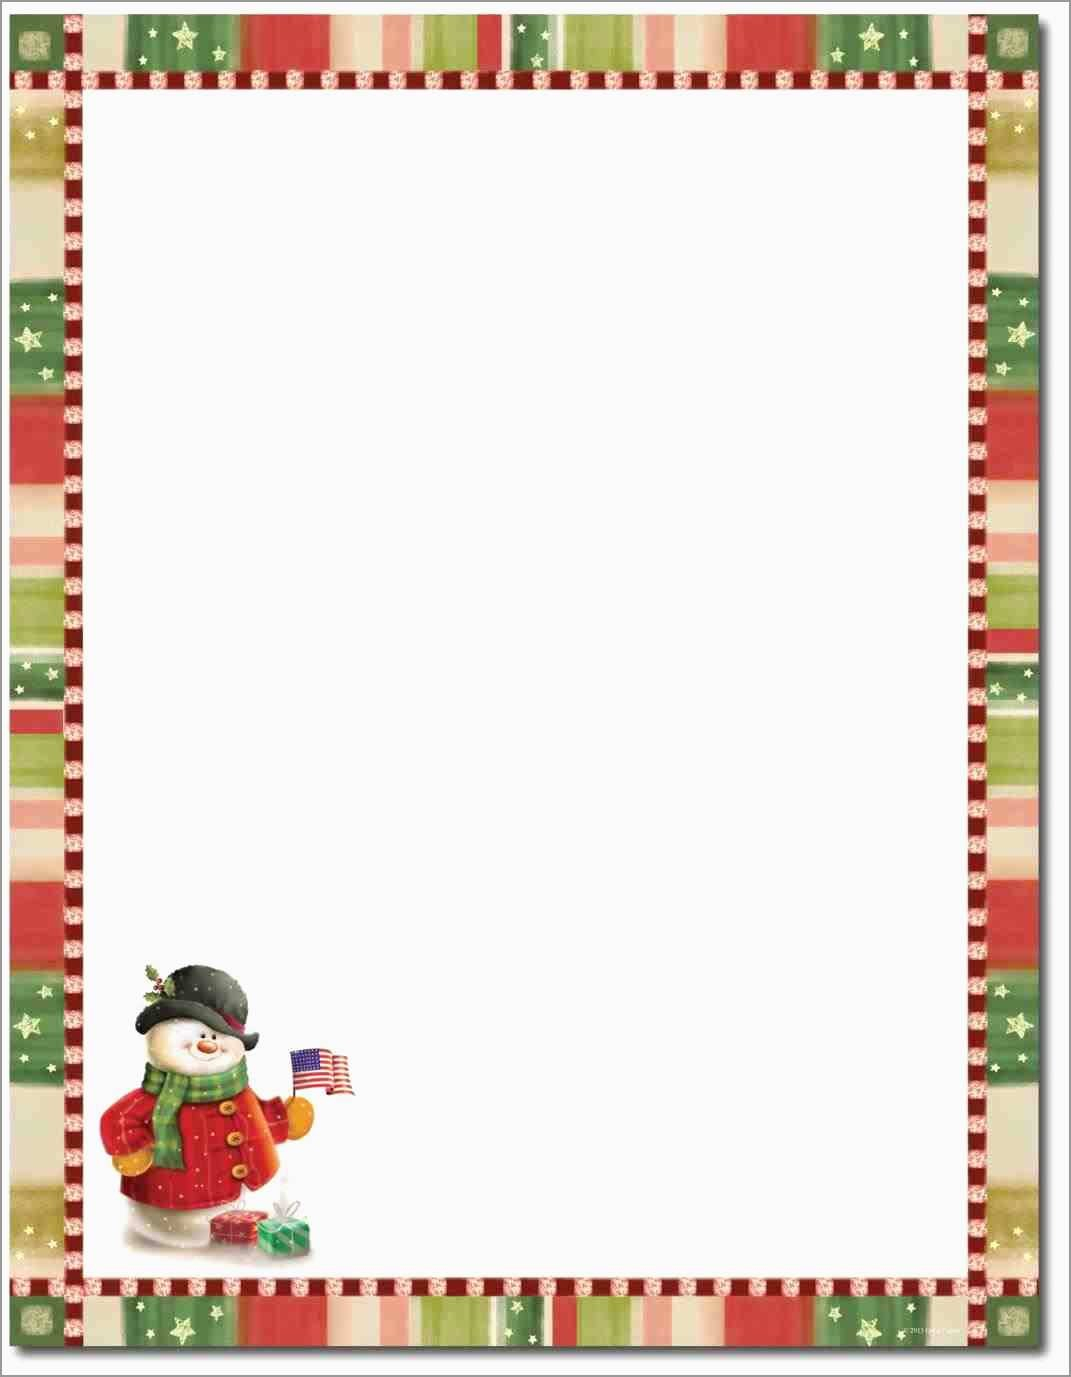 Free Christmas Letter Templates Microsoft Word Prettier Free With Christmas Letter Templates Free Printable